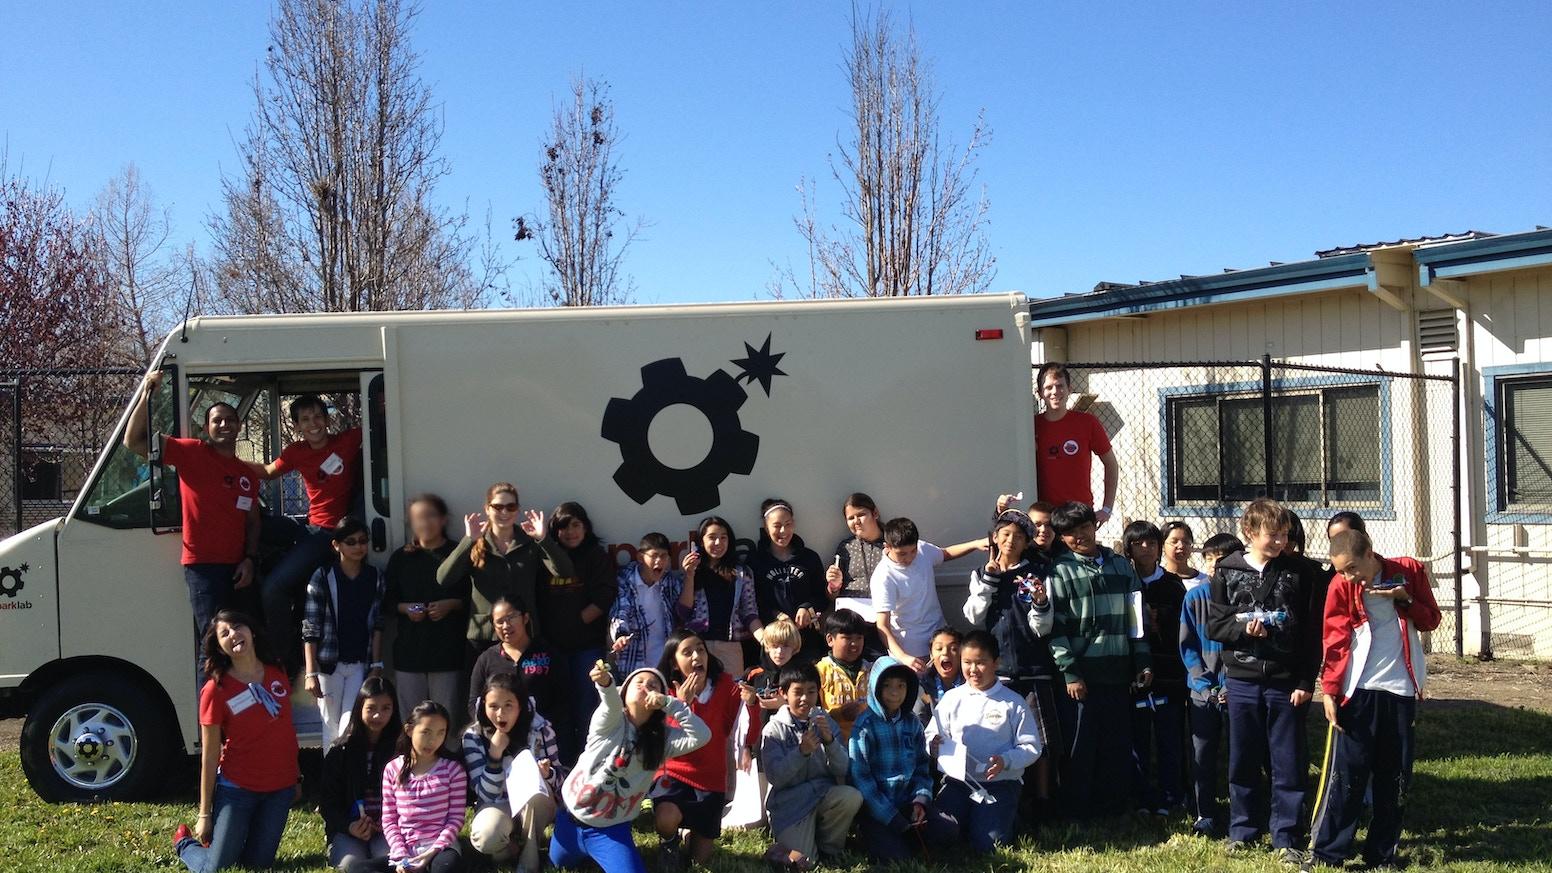 Truck Edge Mobile >> Sparklab The Educational Build Mobile By Jason Chua